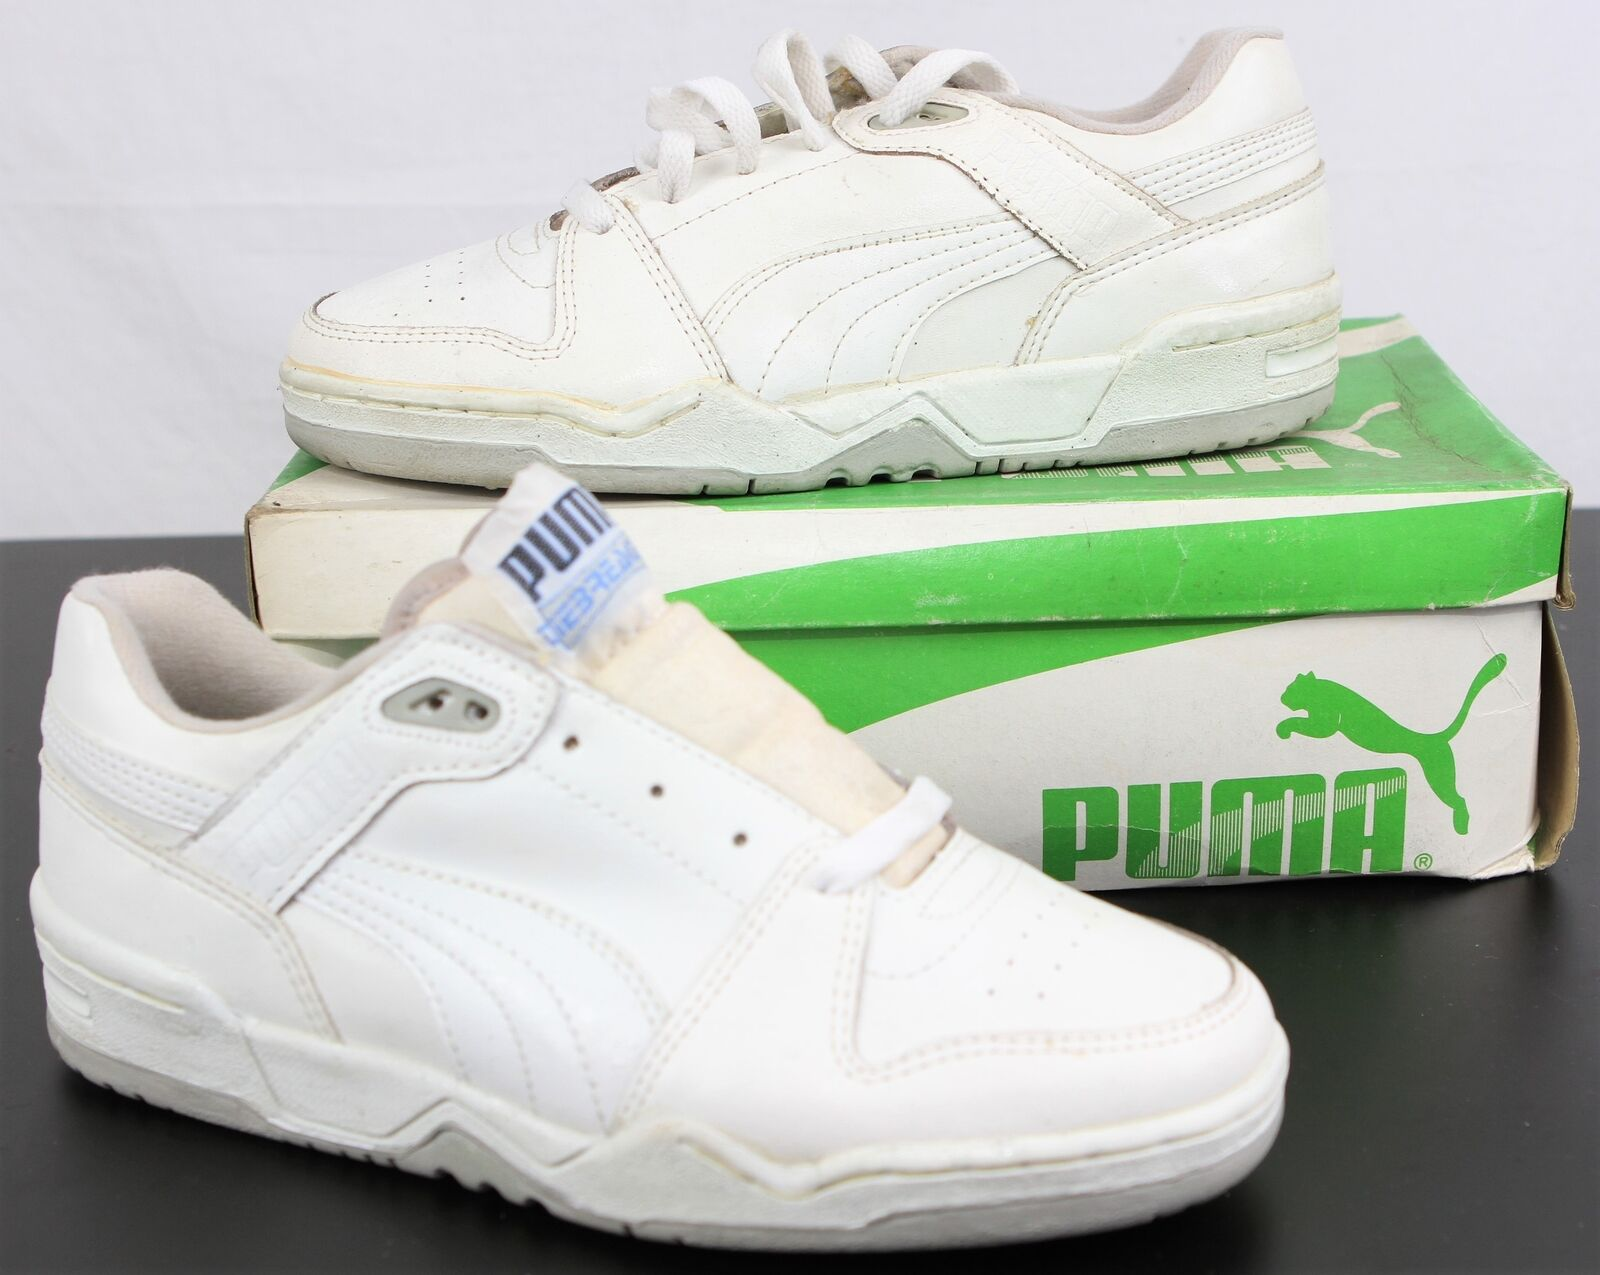 DEADSTOCK 80s 90s PUMA 'tiebreakers'S Zapatillas blancoo Reino Unido 7